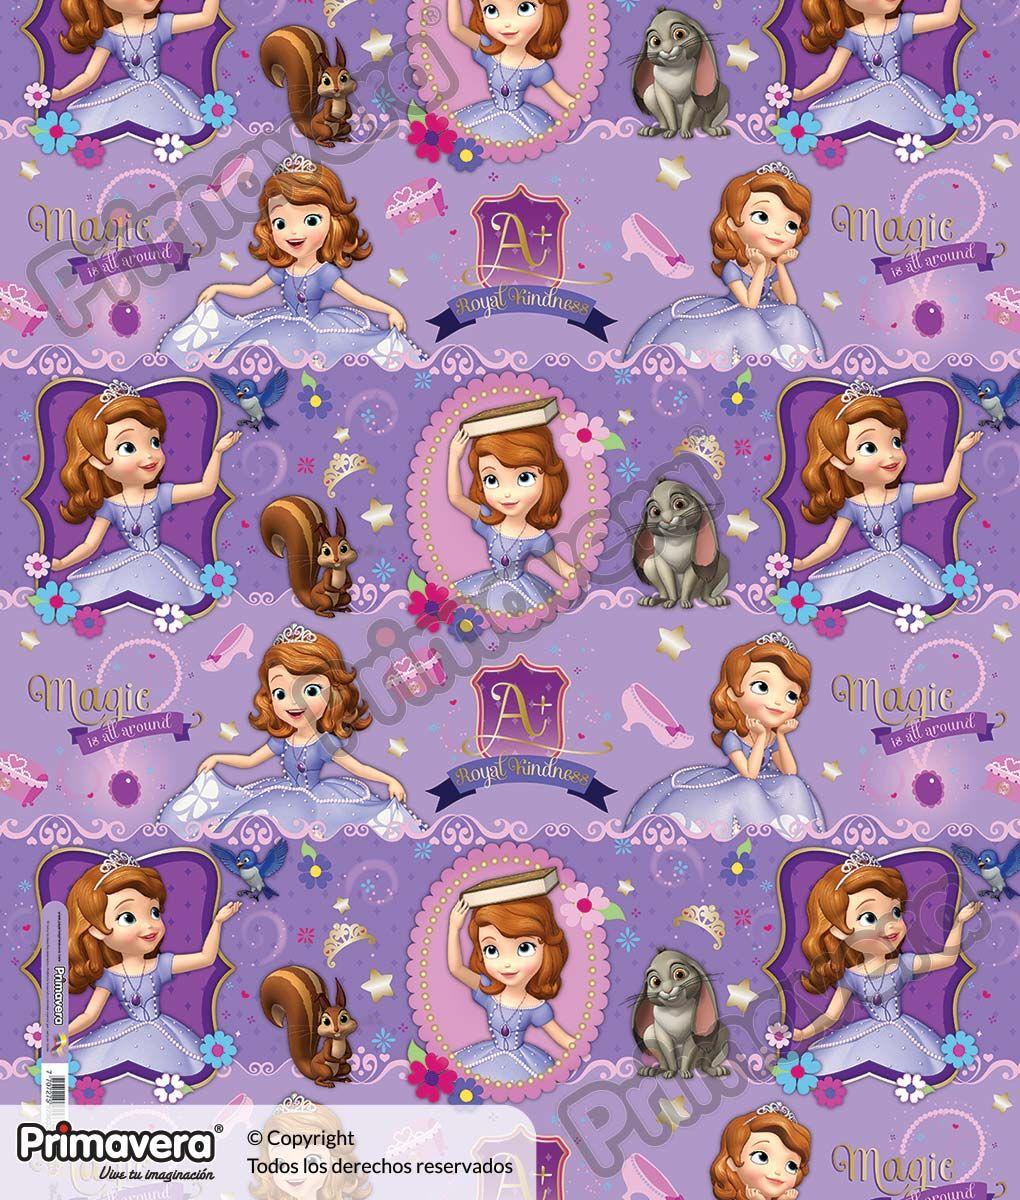 Papel Regalo Princesita Sofia 1-18-915 http://envoltura ...